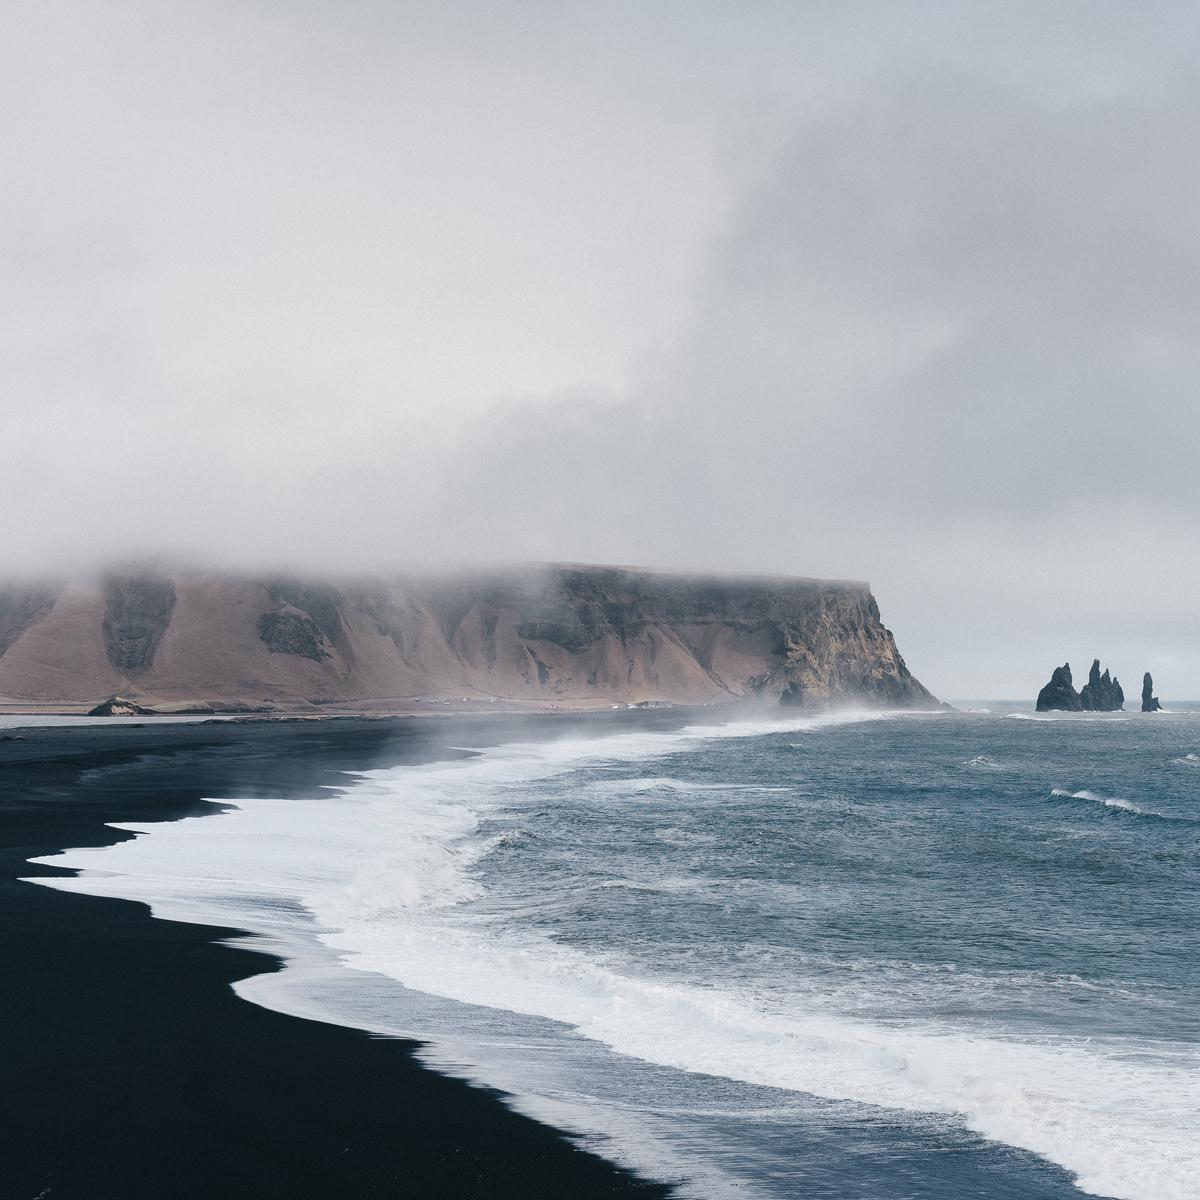 Island © Adam Jang | Unsplash